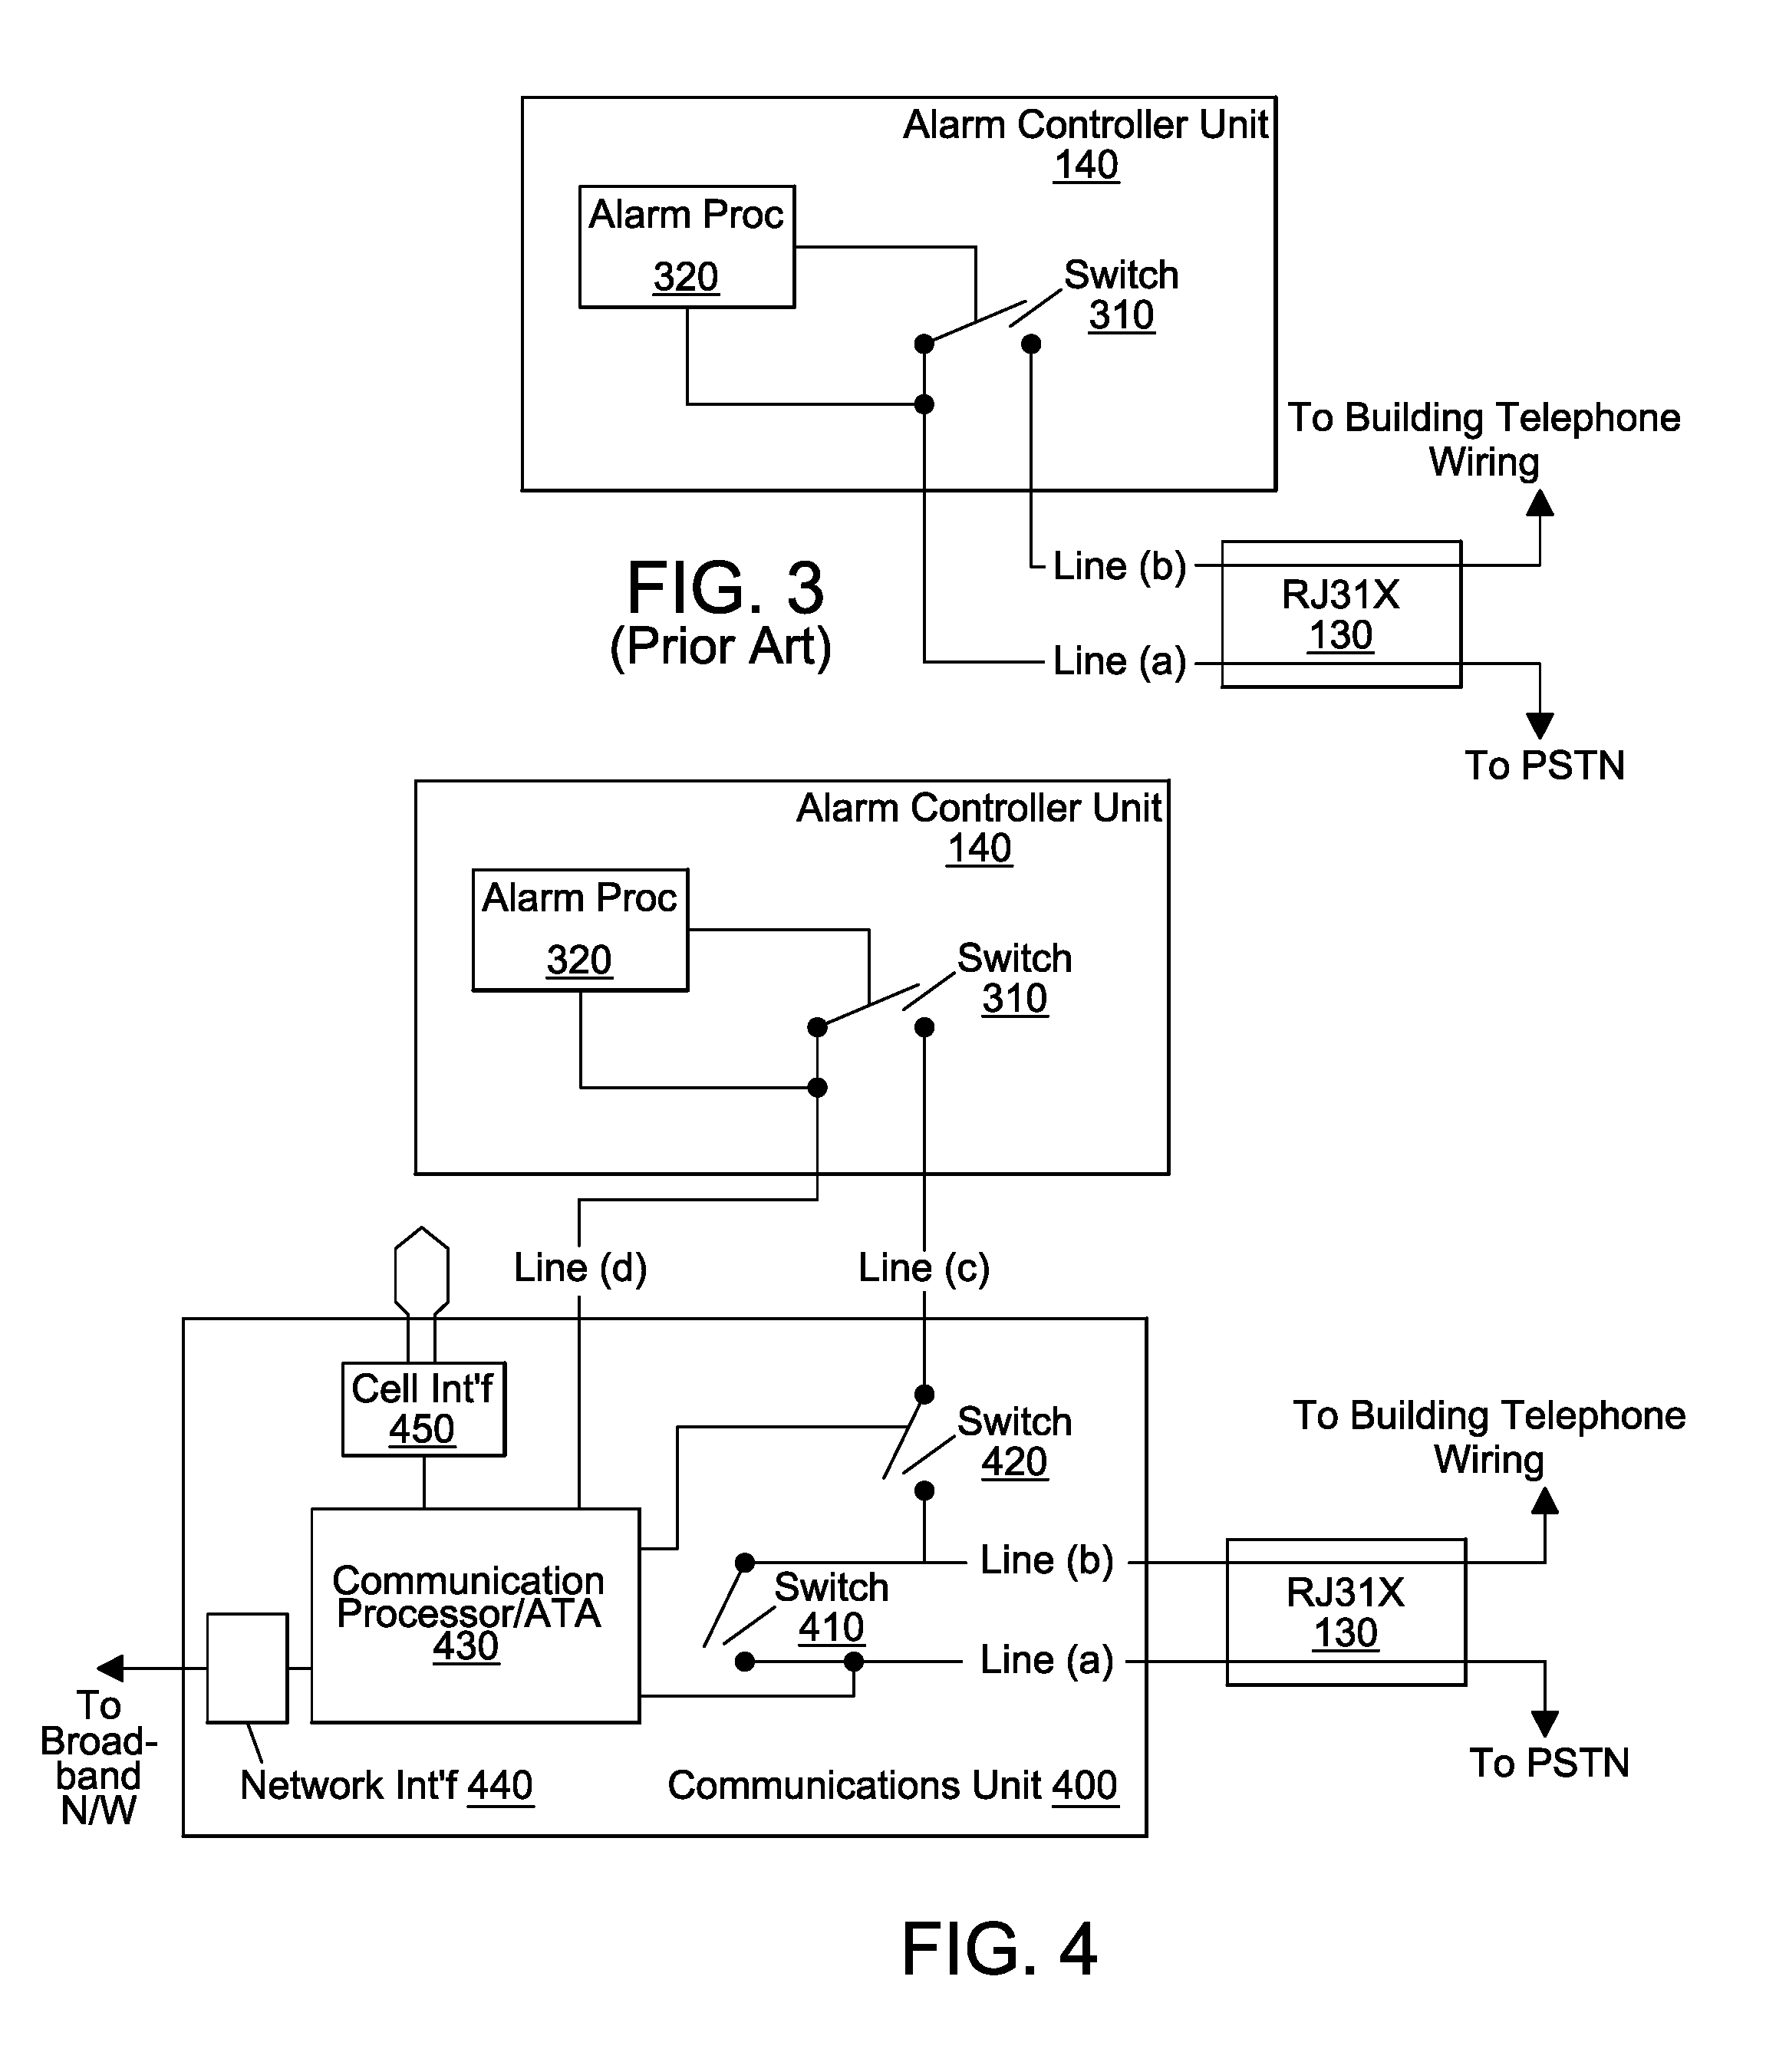 Patent US 10,140,840 B2